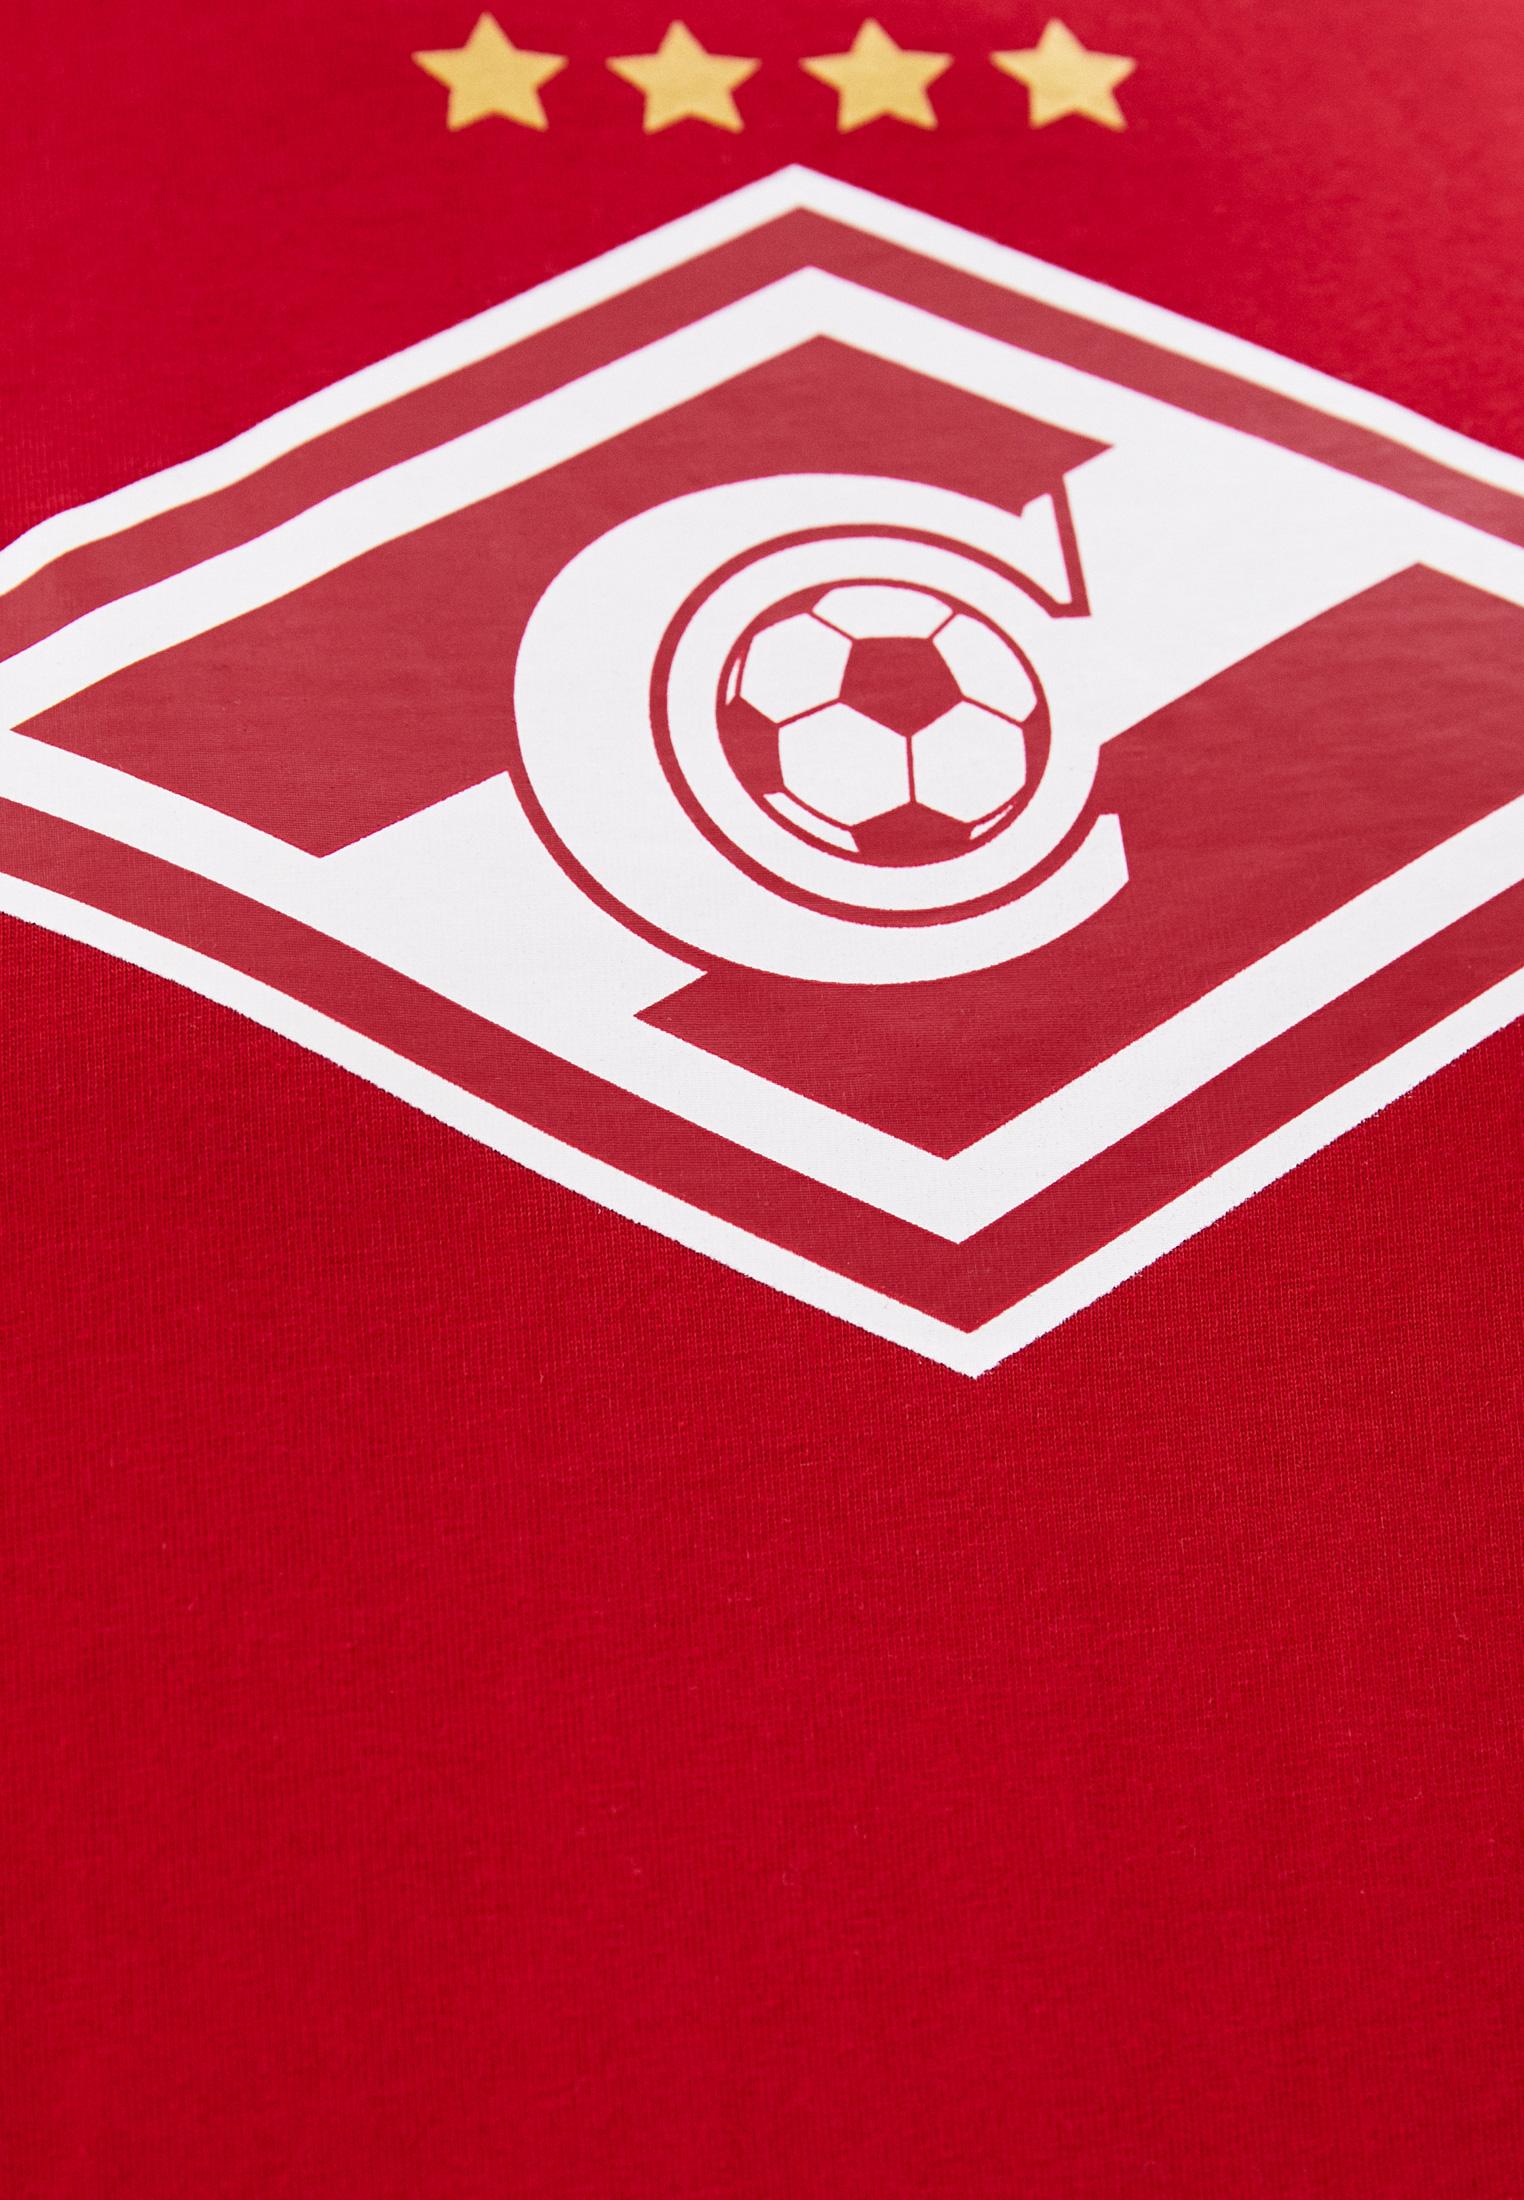 Футболка Atributika & Club™ 110610: изображение 3